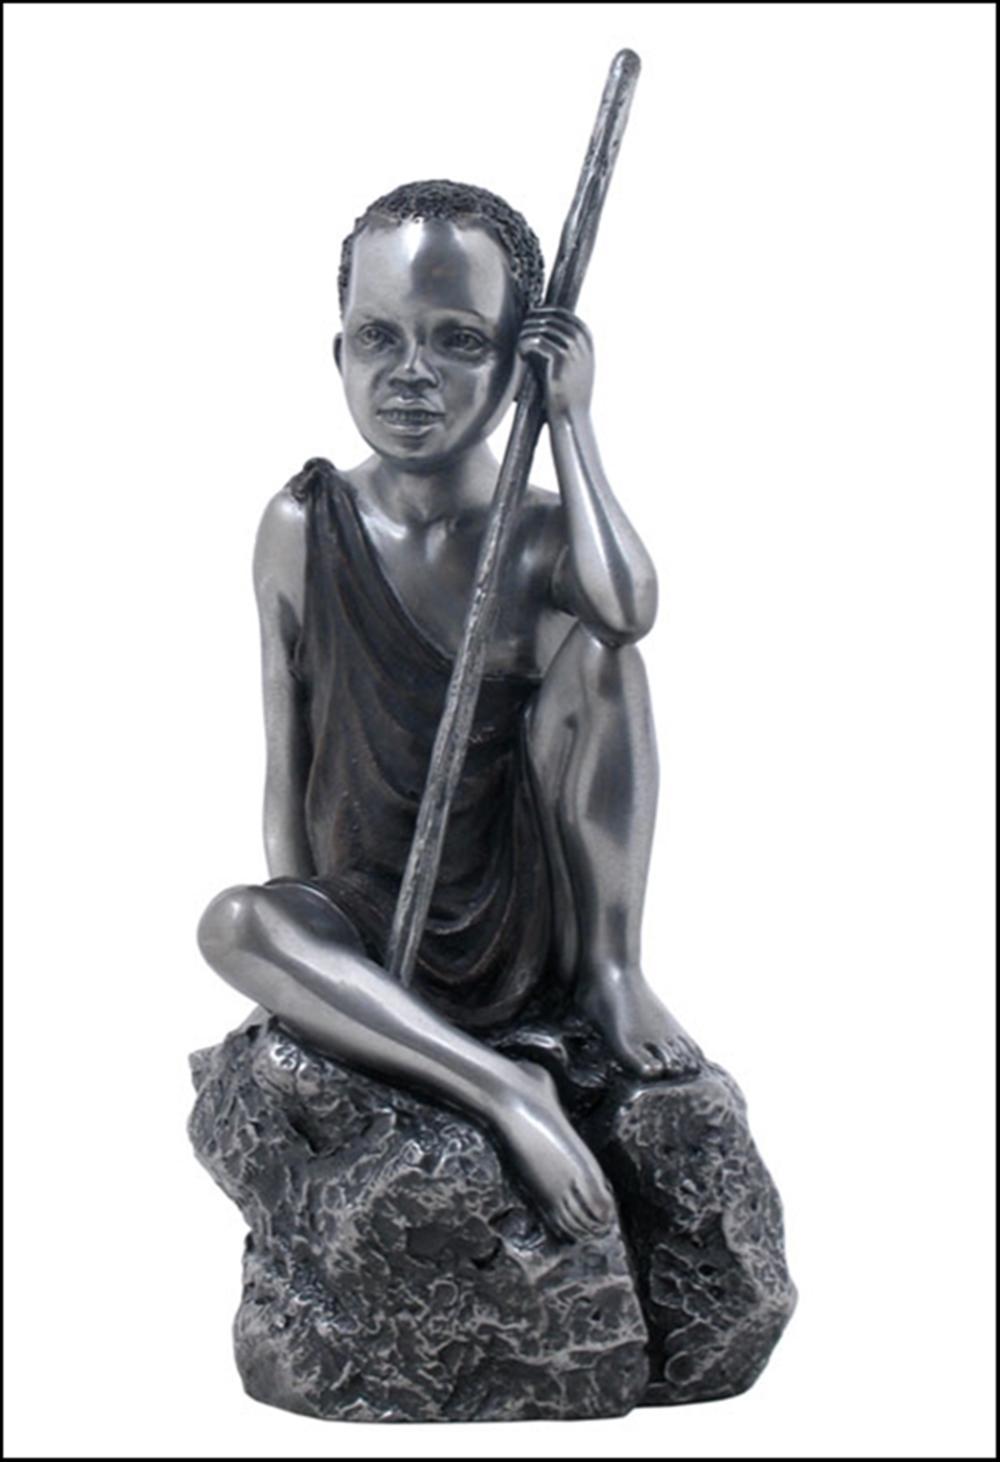 MAASAI KID SITTING ON THE ROCK Art